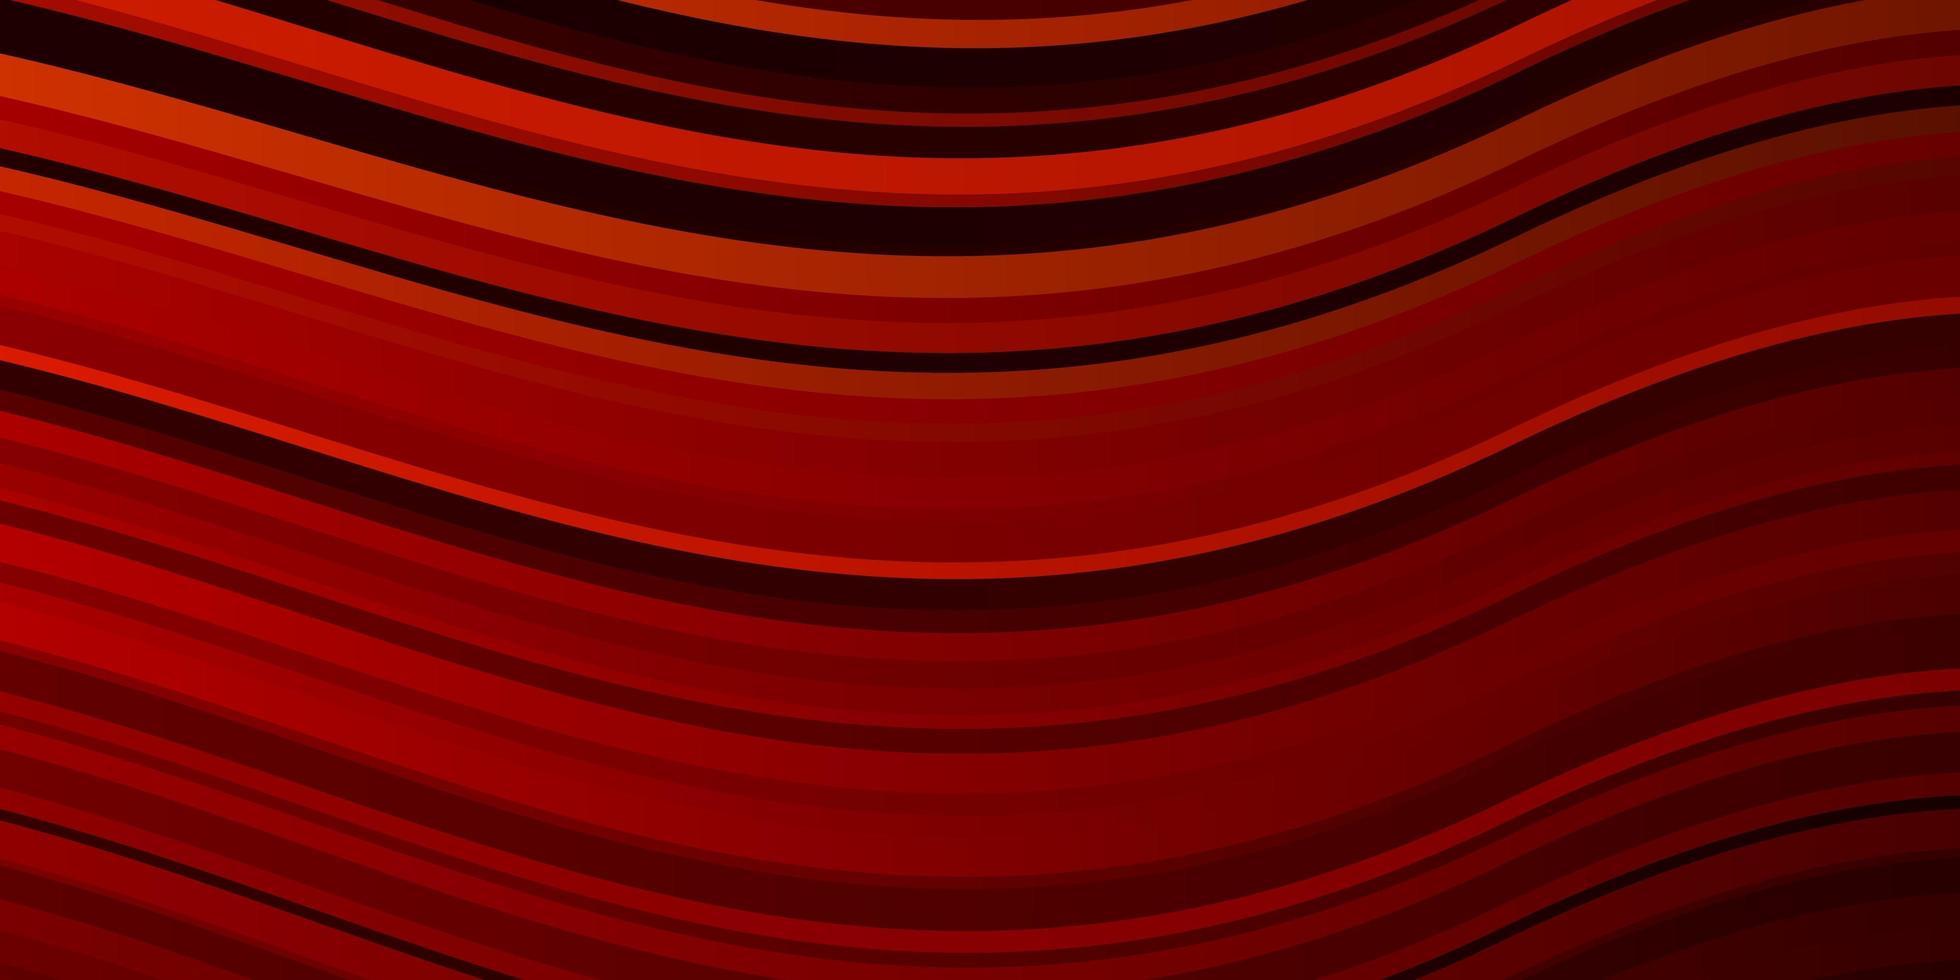 pano de fundo vector vermelho escuro com arco circular.